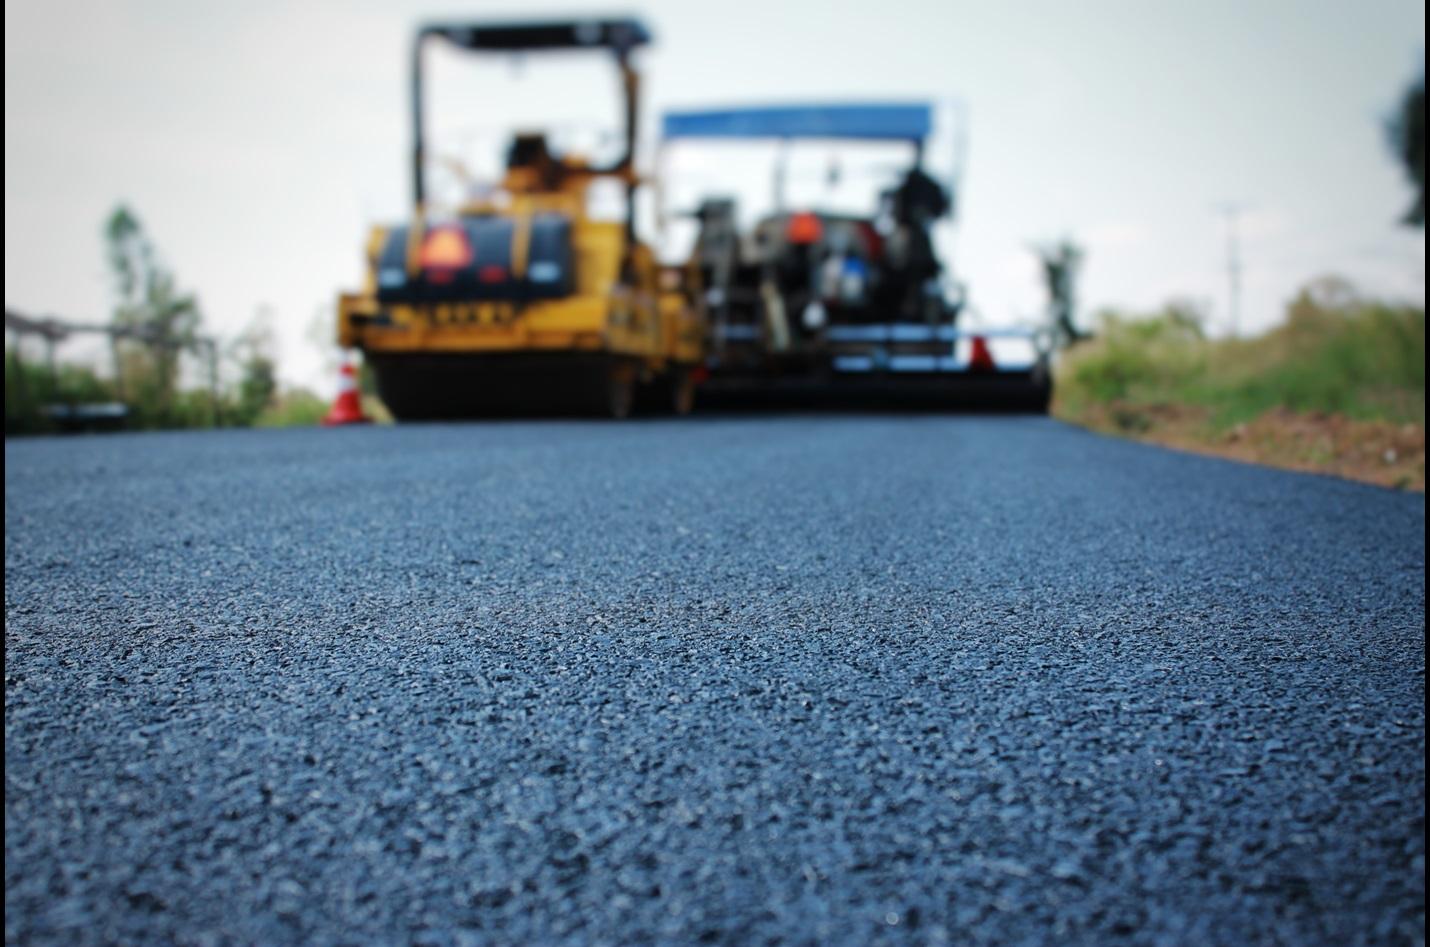 Resurfacing asphalt-based construction